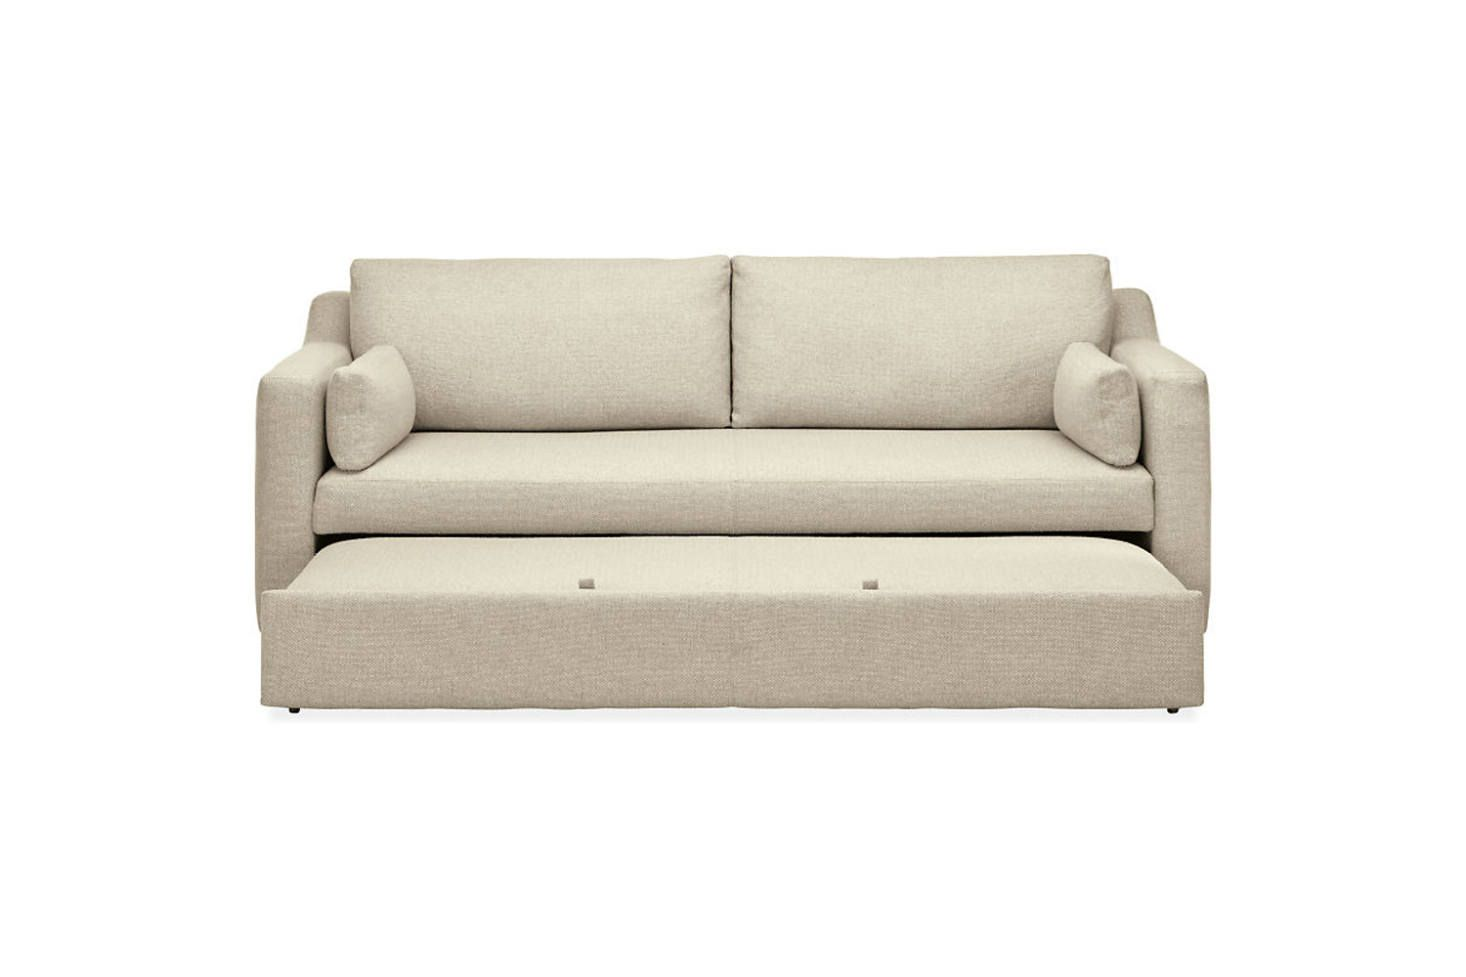 Incredible 10 Easy Pieces Good Looking Sleeper Sofas Sleeper Sofa Bralicious Painted Fabric Chair Ideas Braliciousco